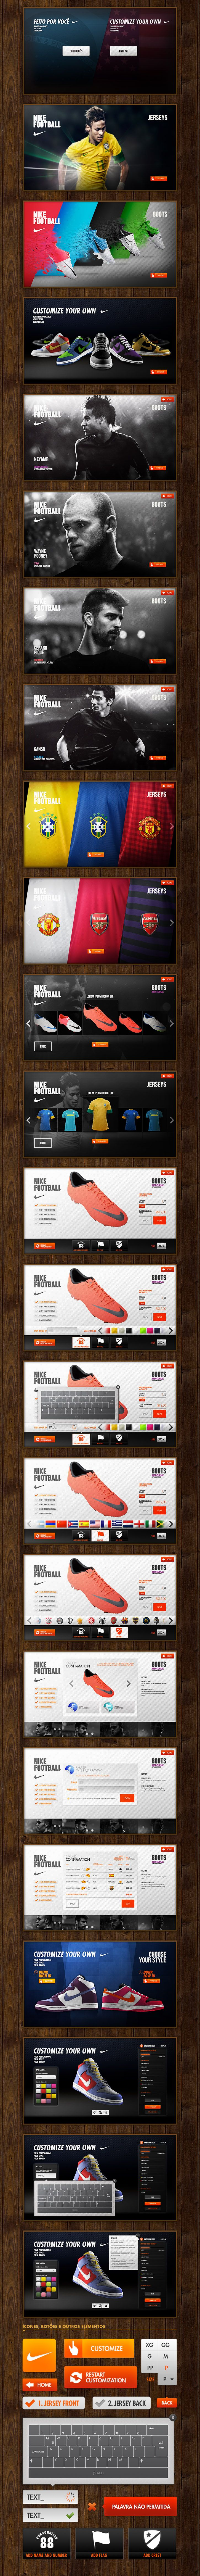 E-shop Nike Touch by Fabricio Alves, via Behance